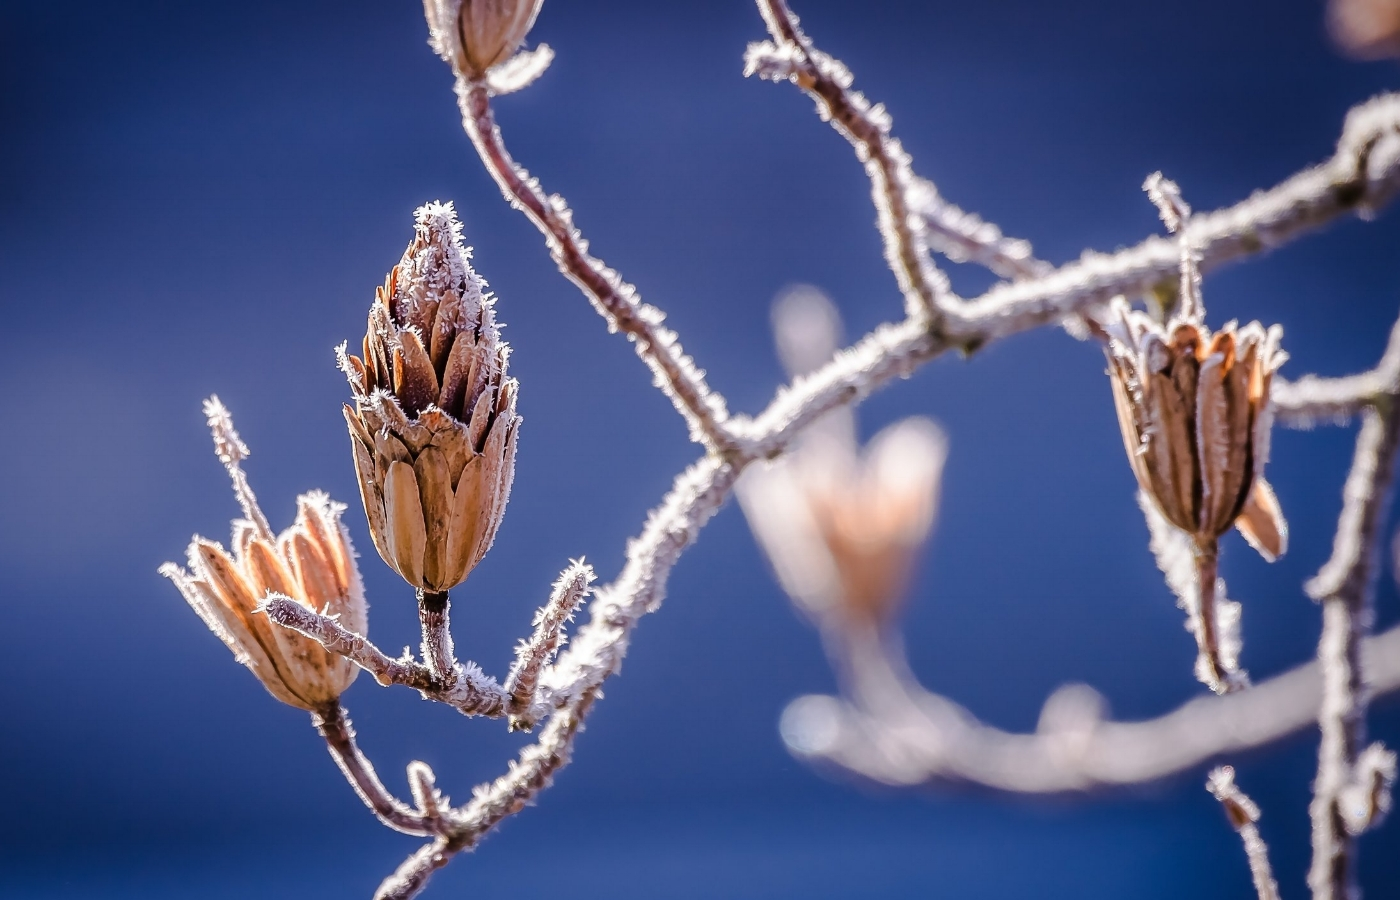 winter-598631.jpg